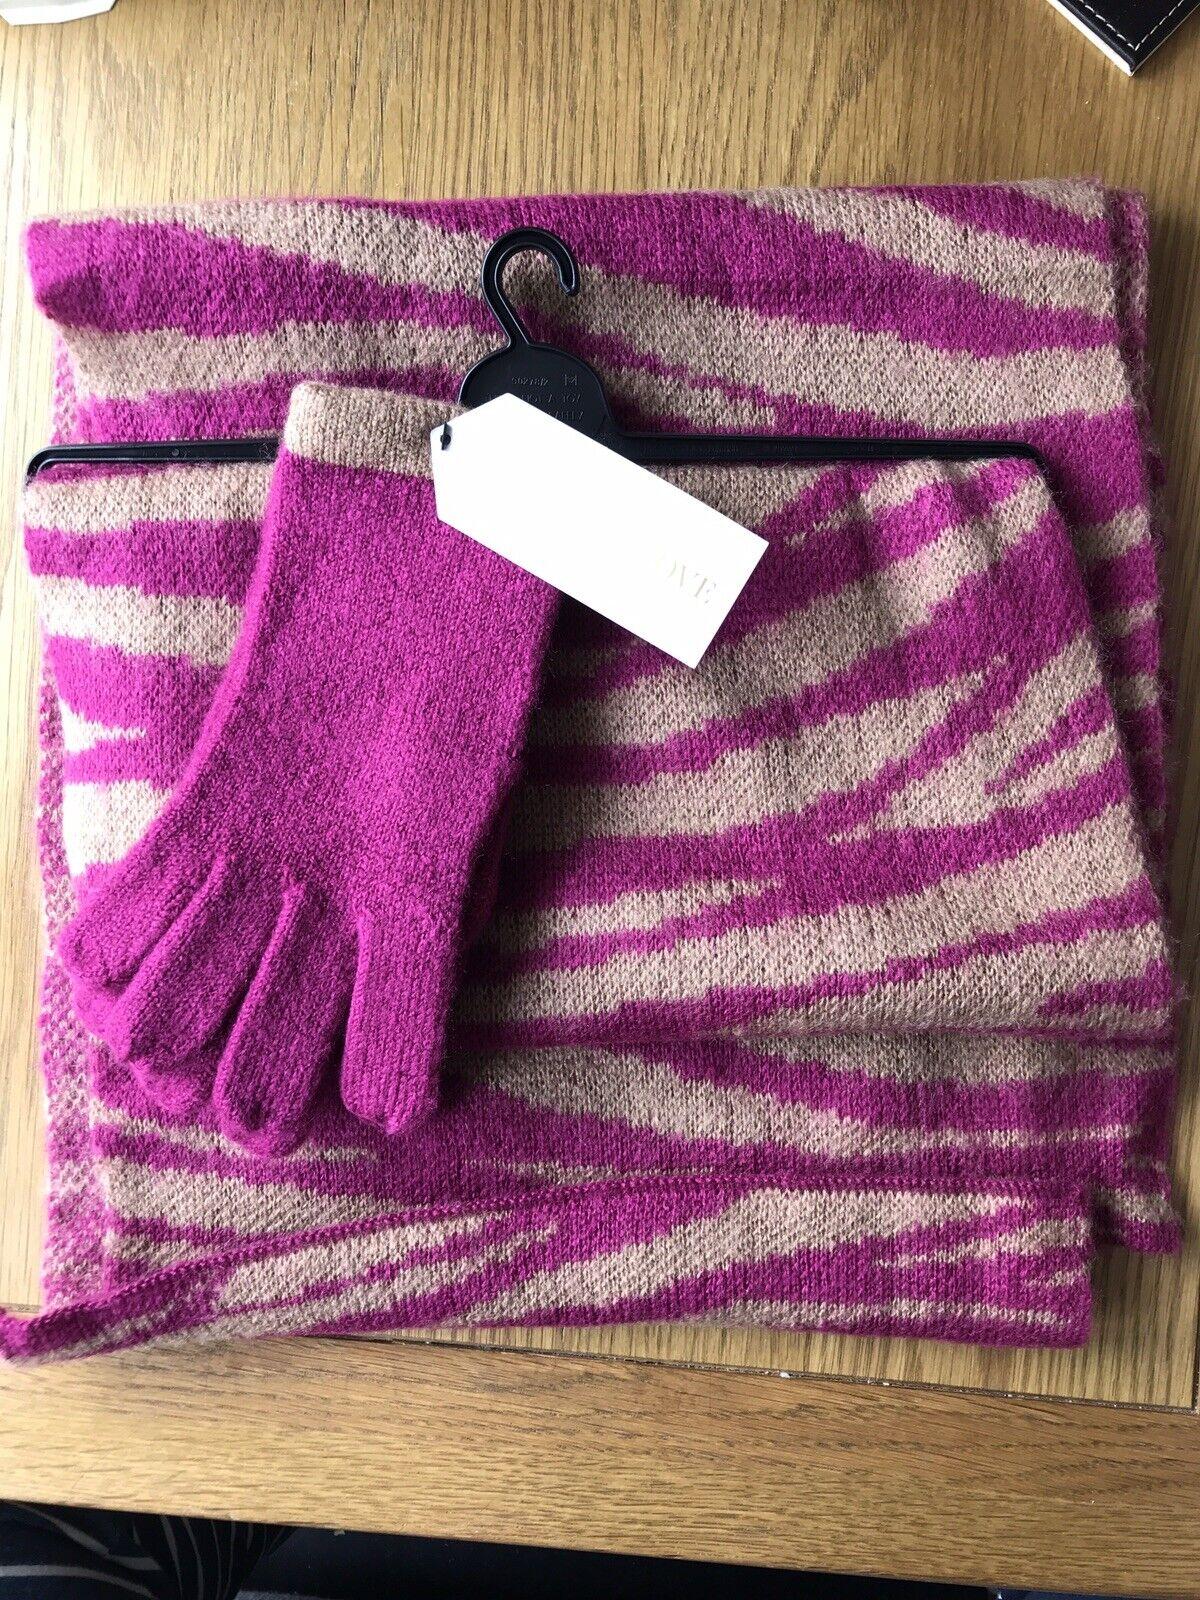 M&S Ladies Scarf & Gloves Set - Pink And Cream